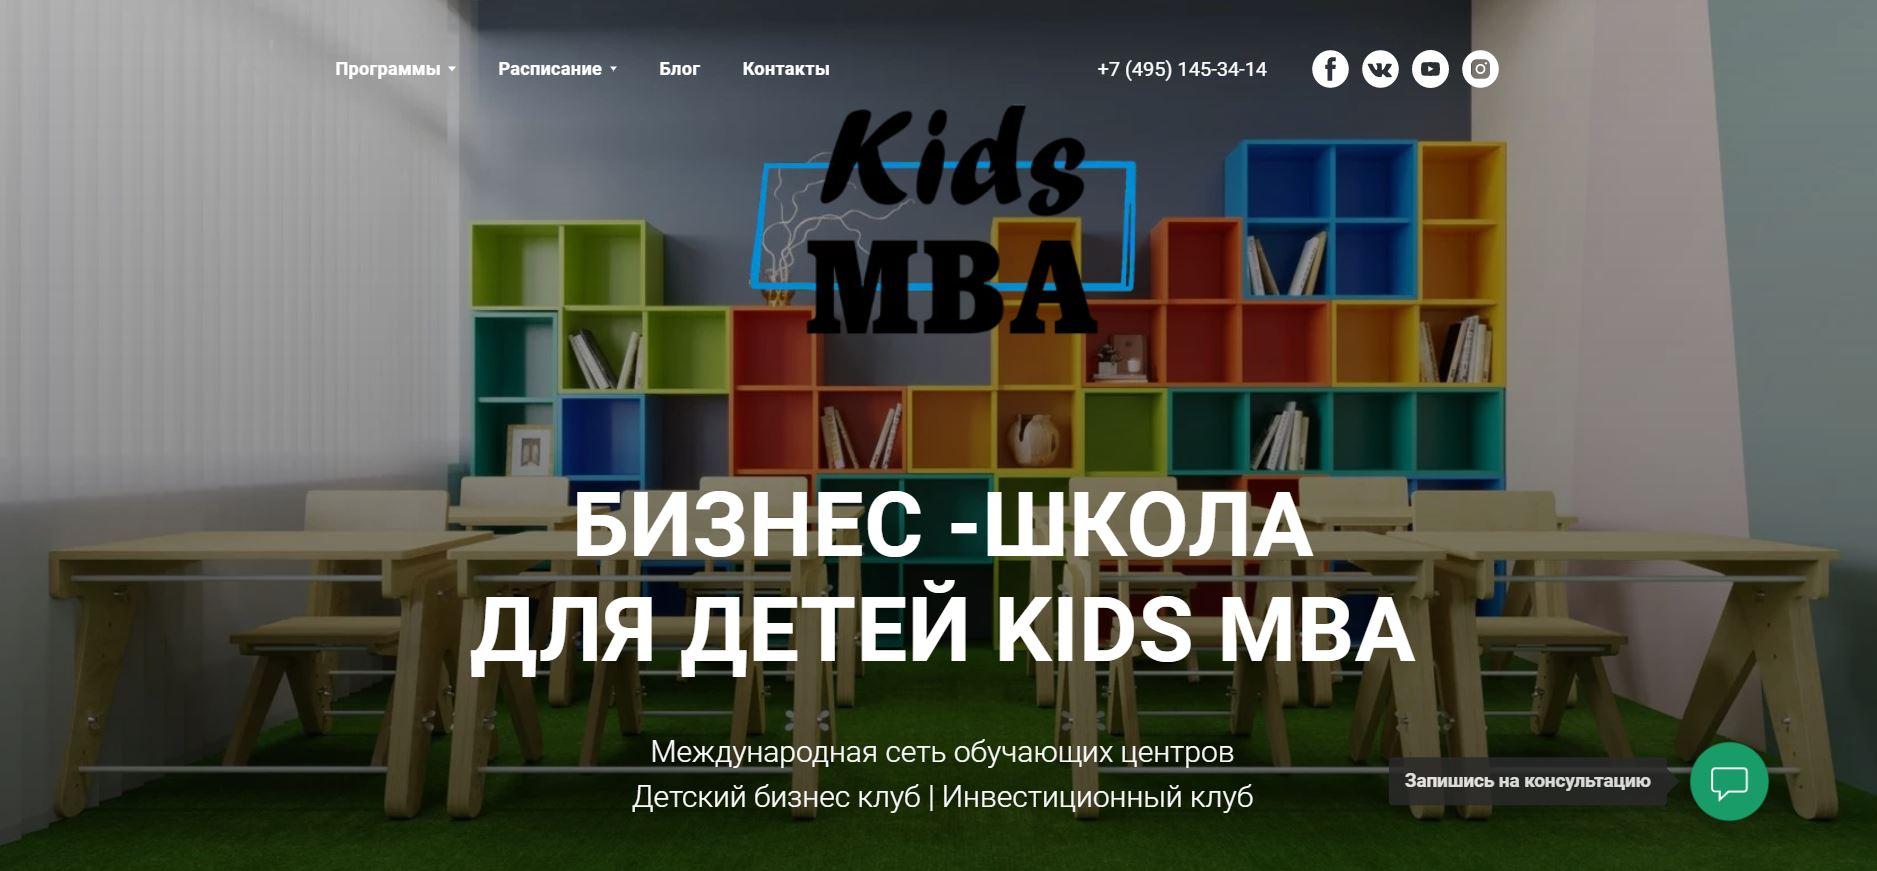 kids mba официальный сайт